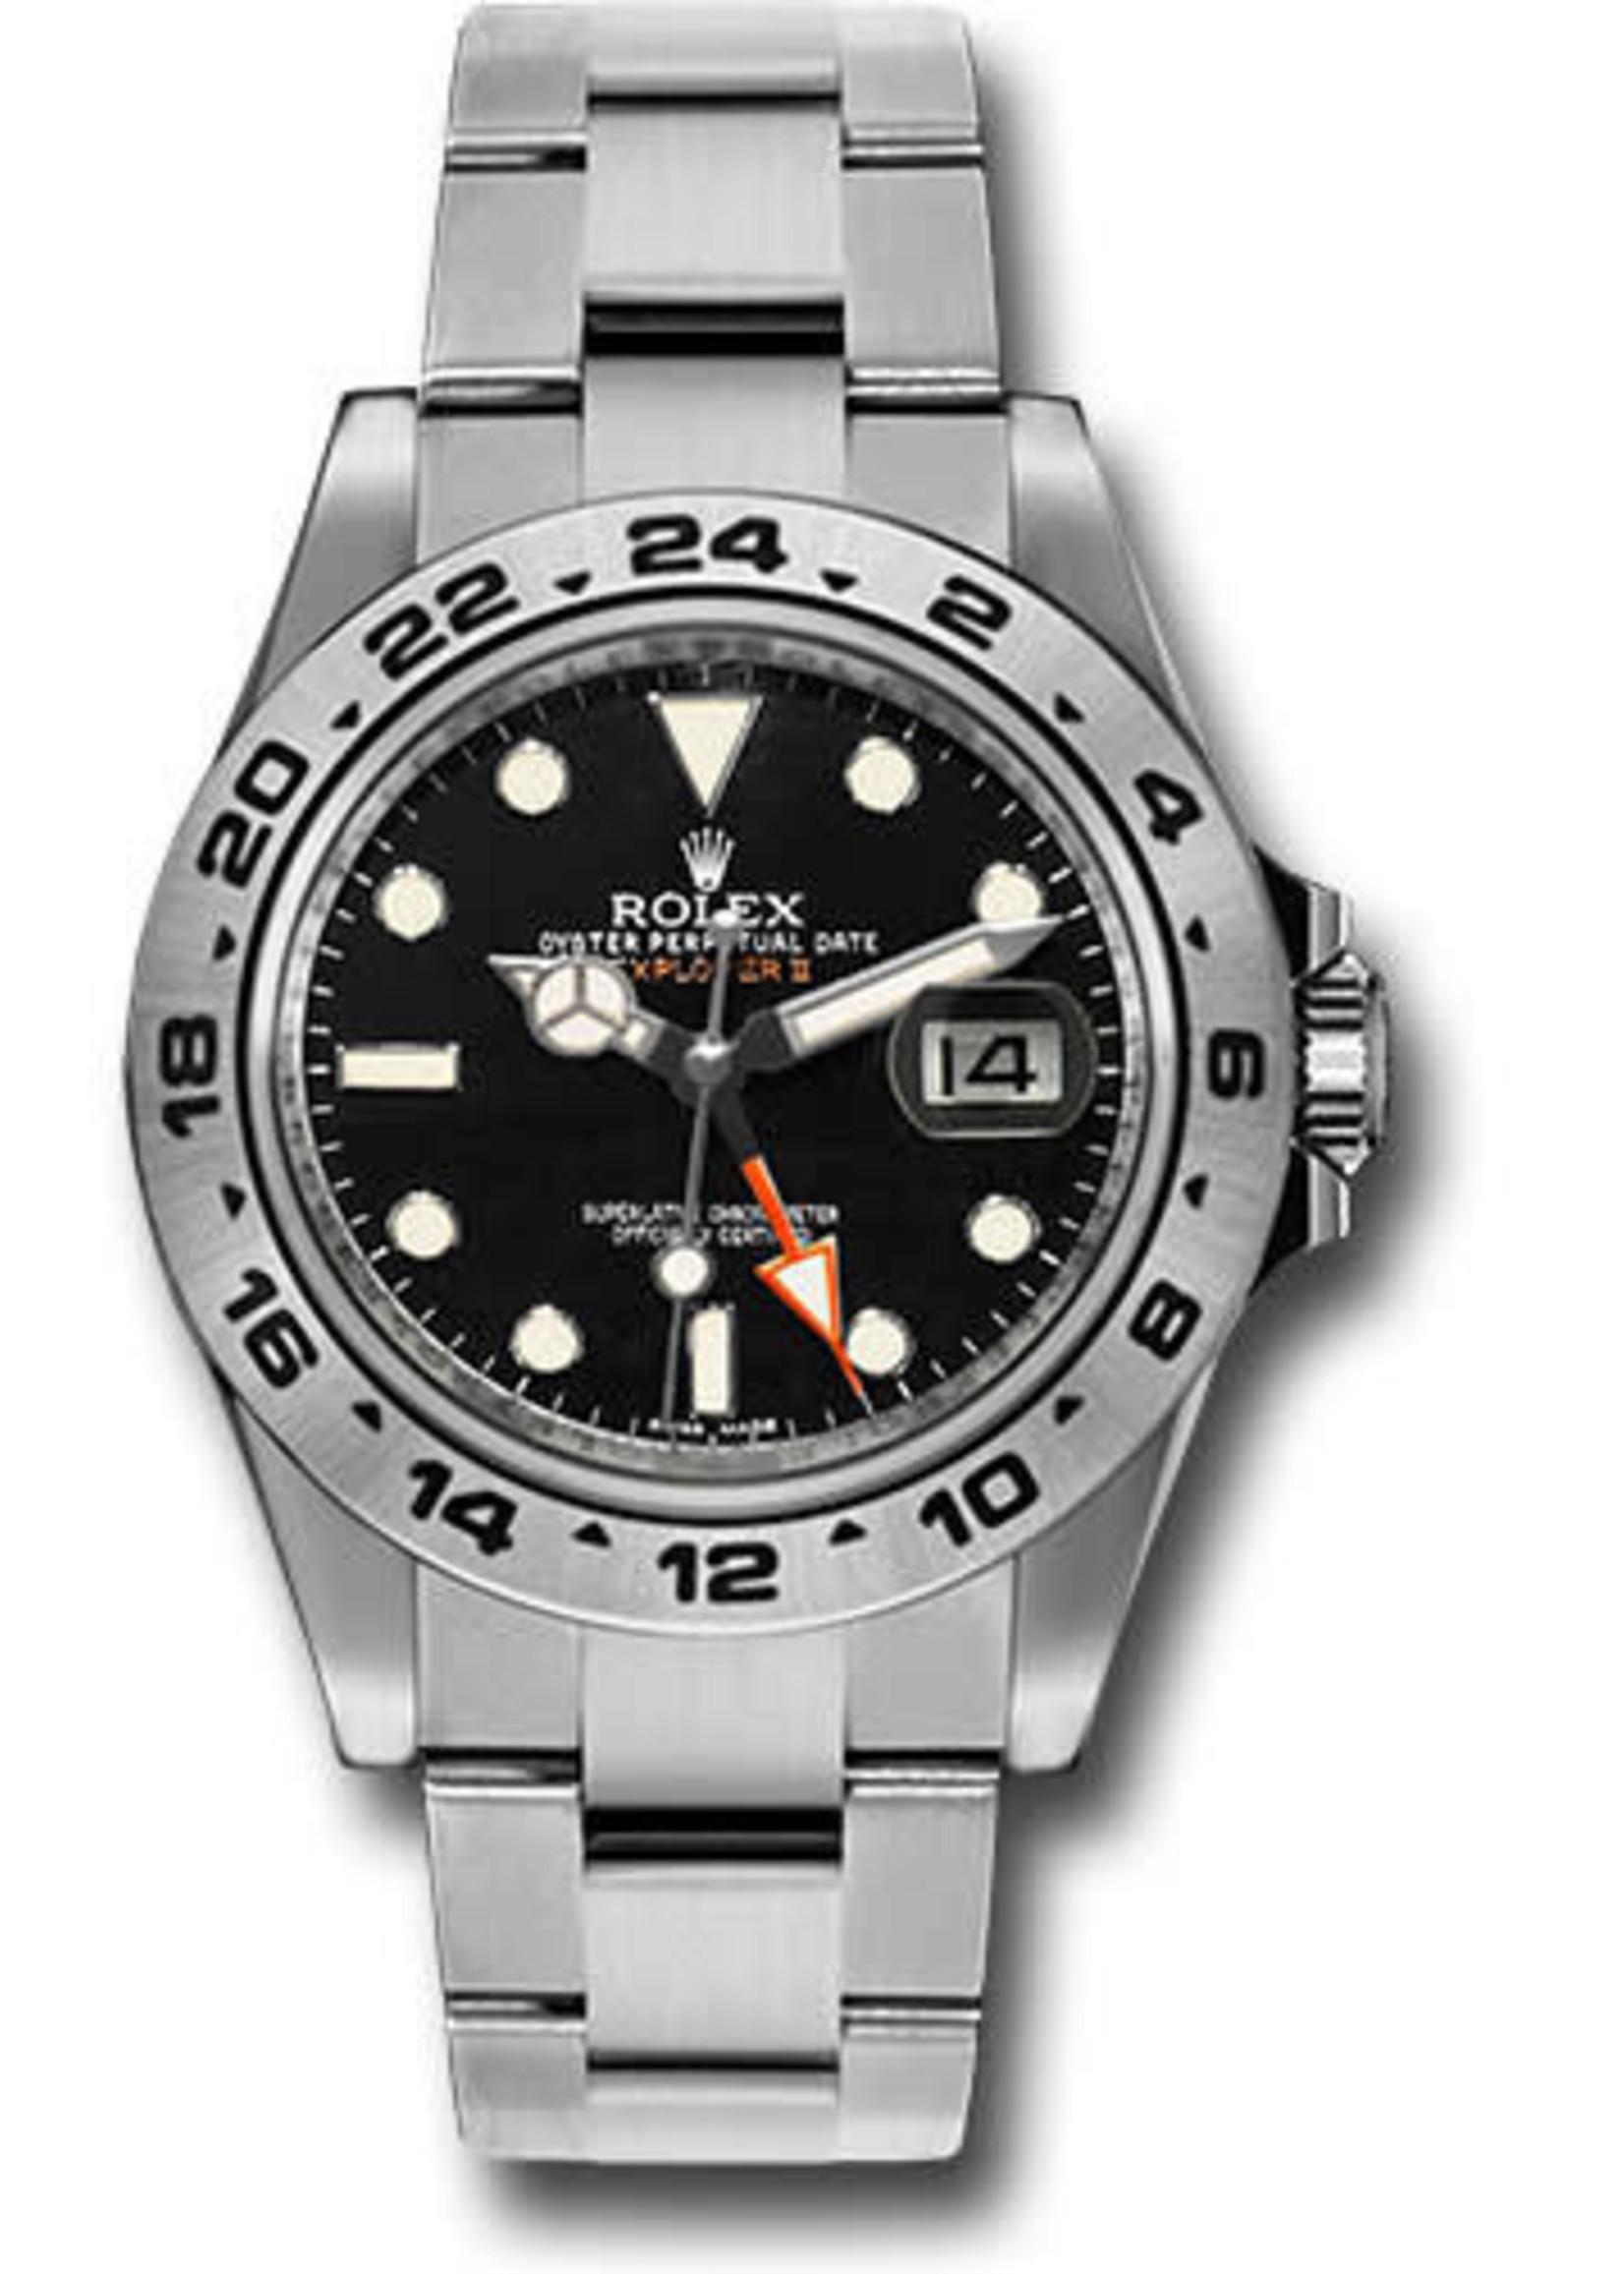 Rolex Watches Rolex Explorer II 42MM (2013 B+P) #216570